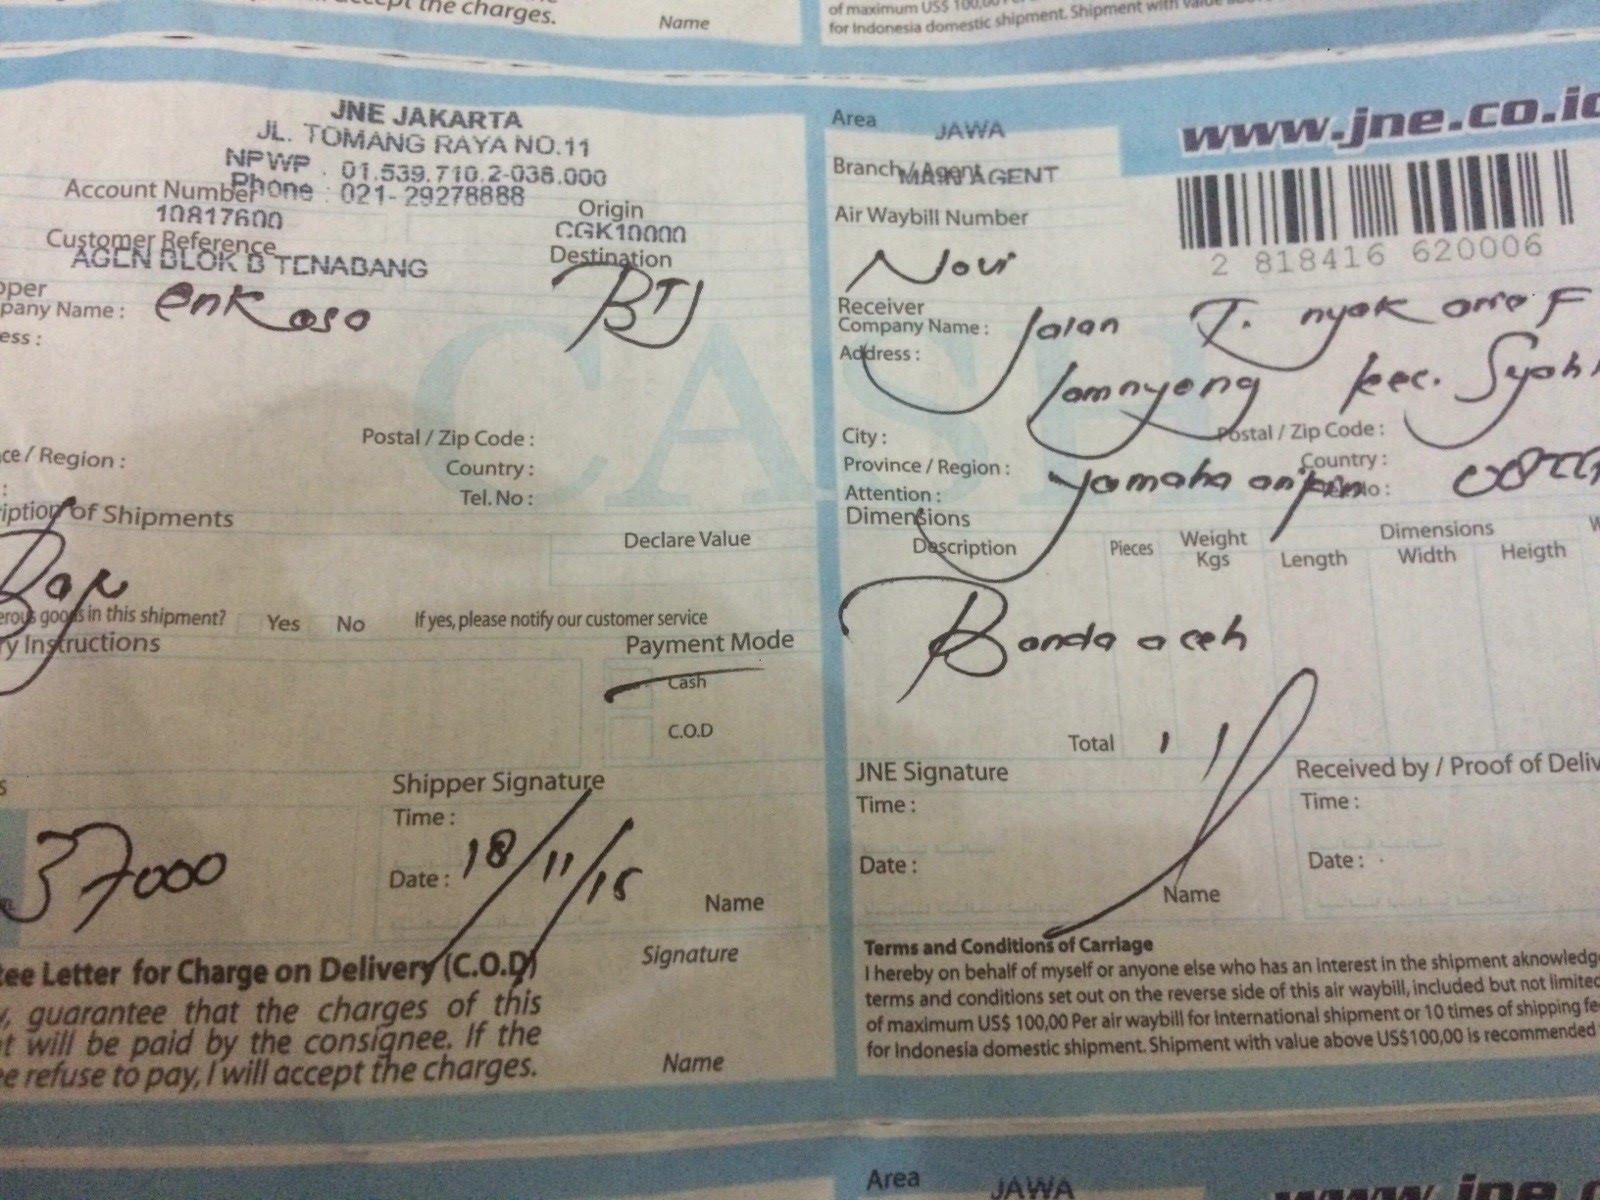 Nomer Resi Novi Jln T Nyak Arief Lamnyong Kec Syahkuala Yamaha Arifin Banda Aceh